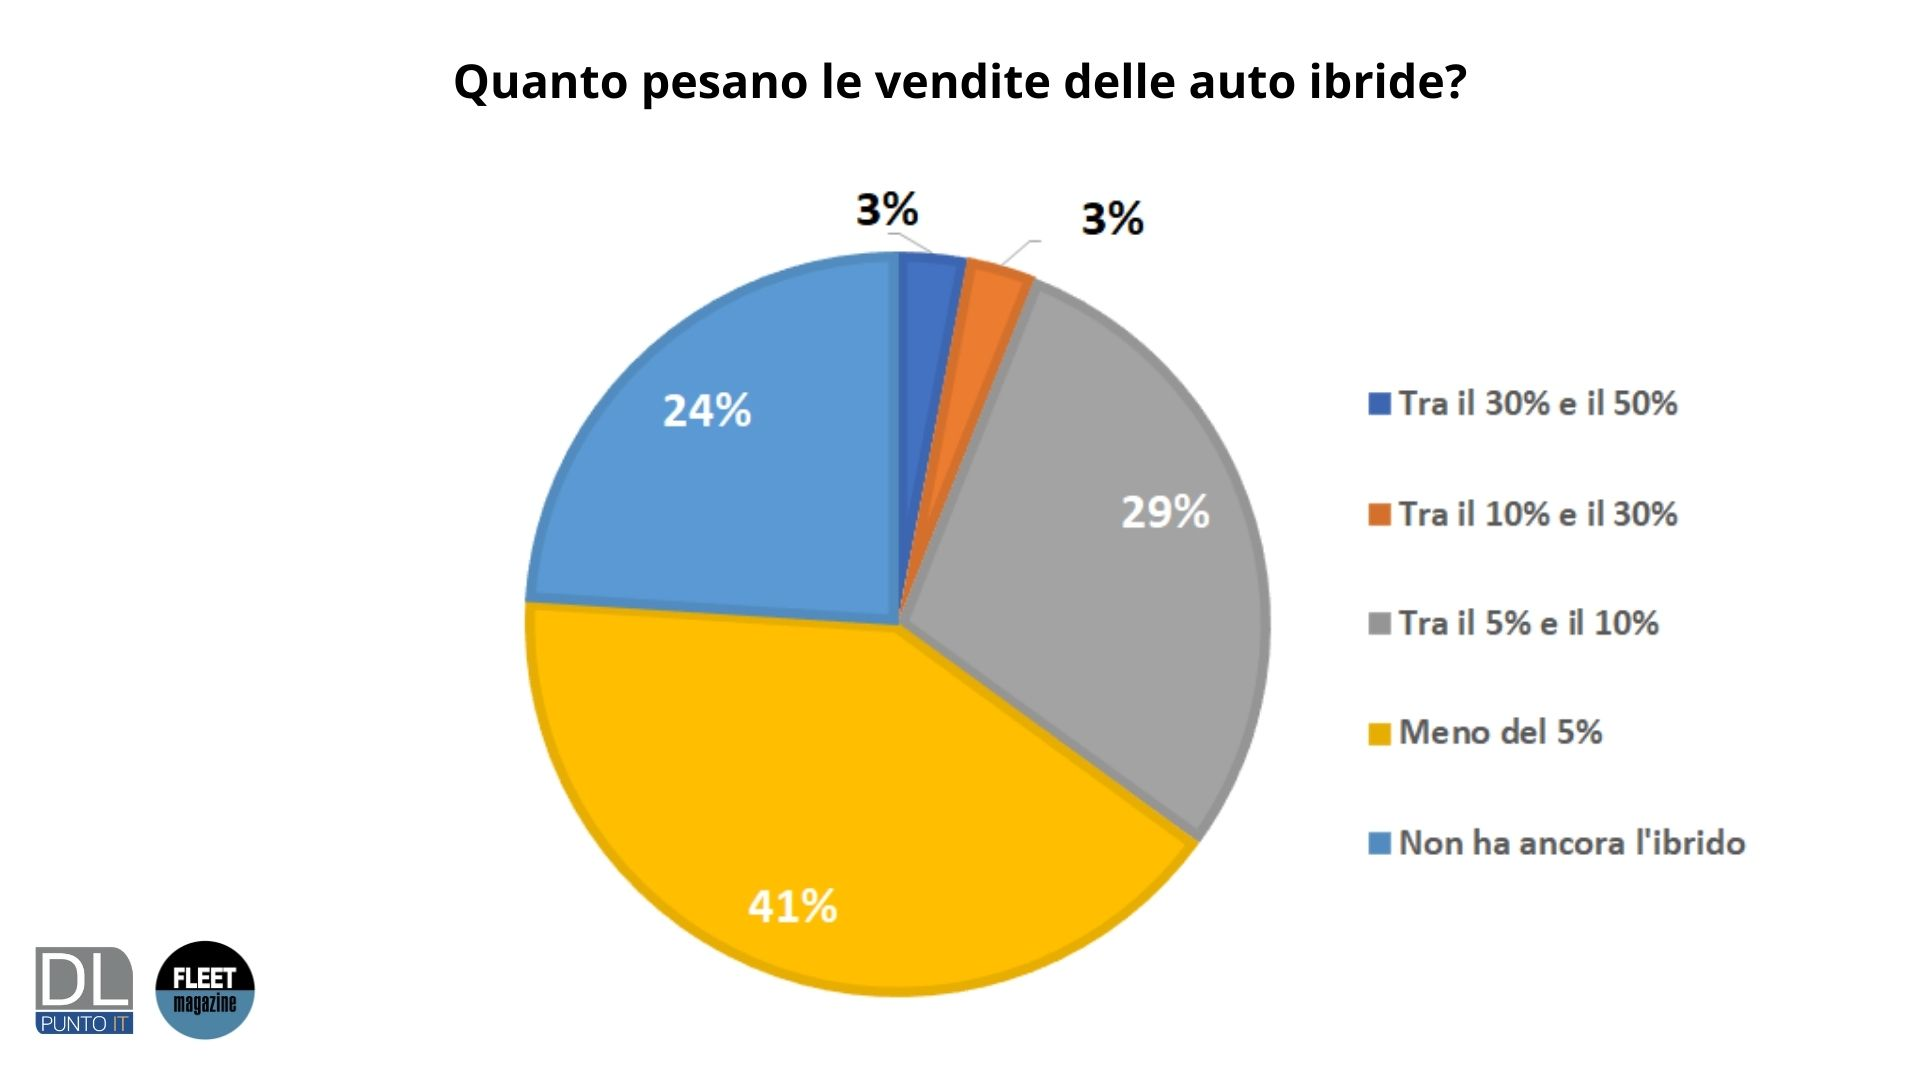 vendite auto ibride quanto pesano